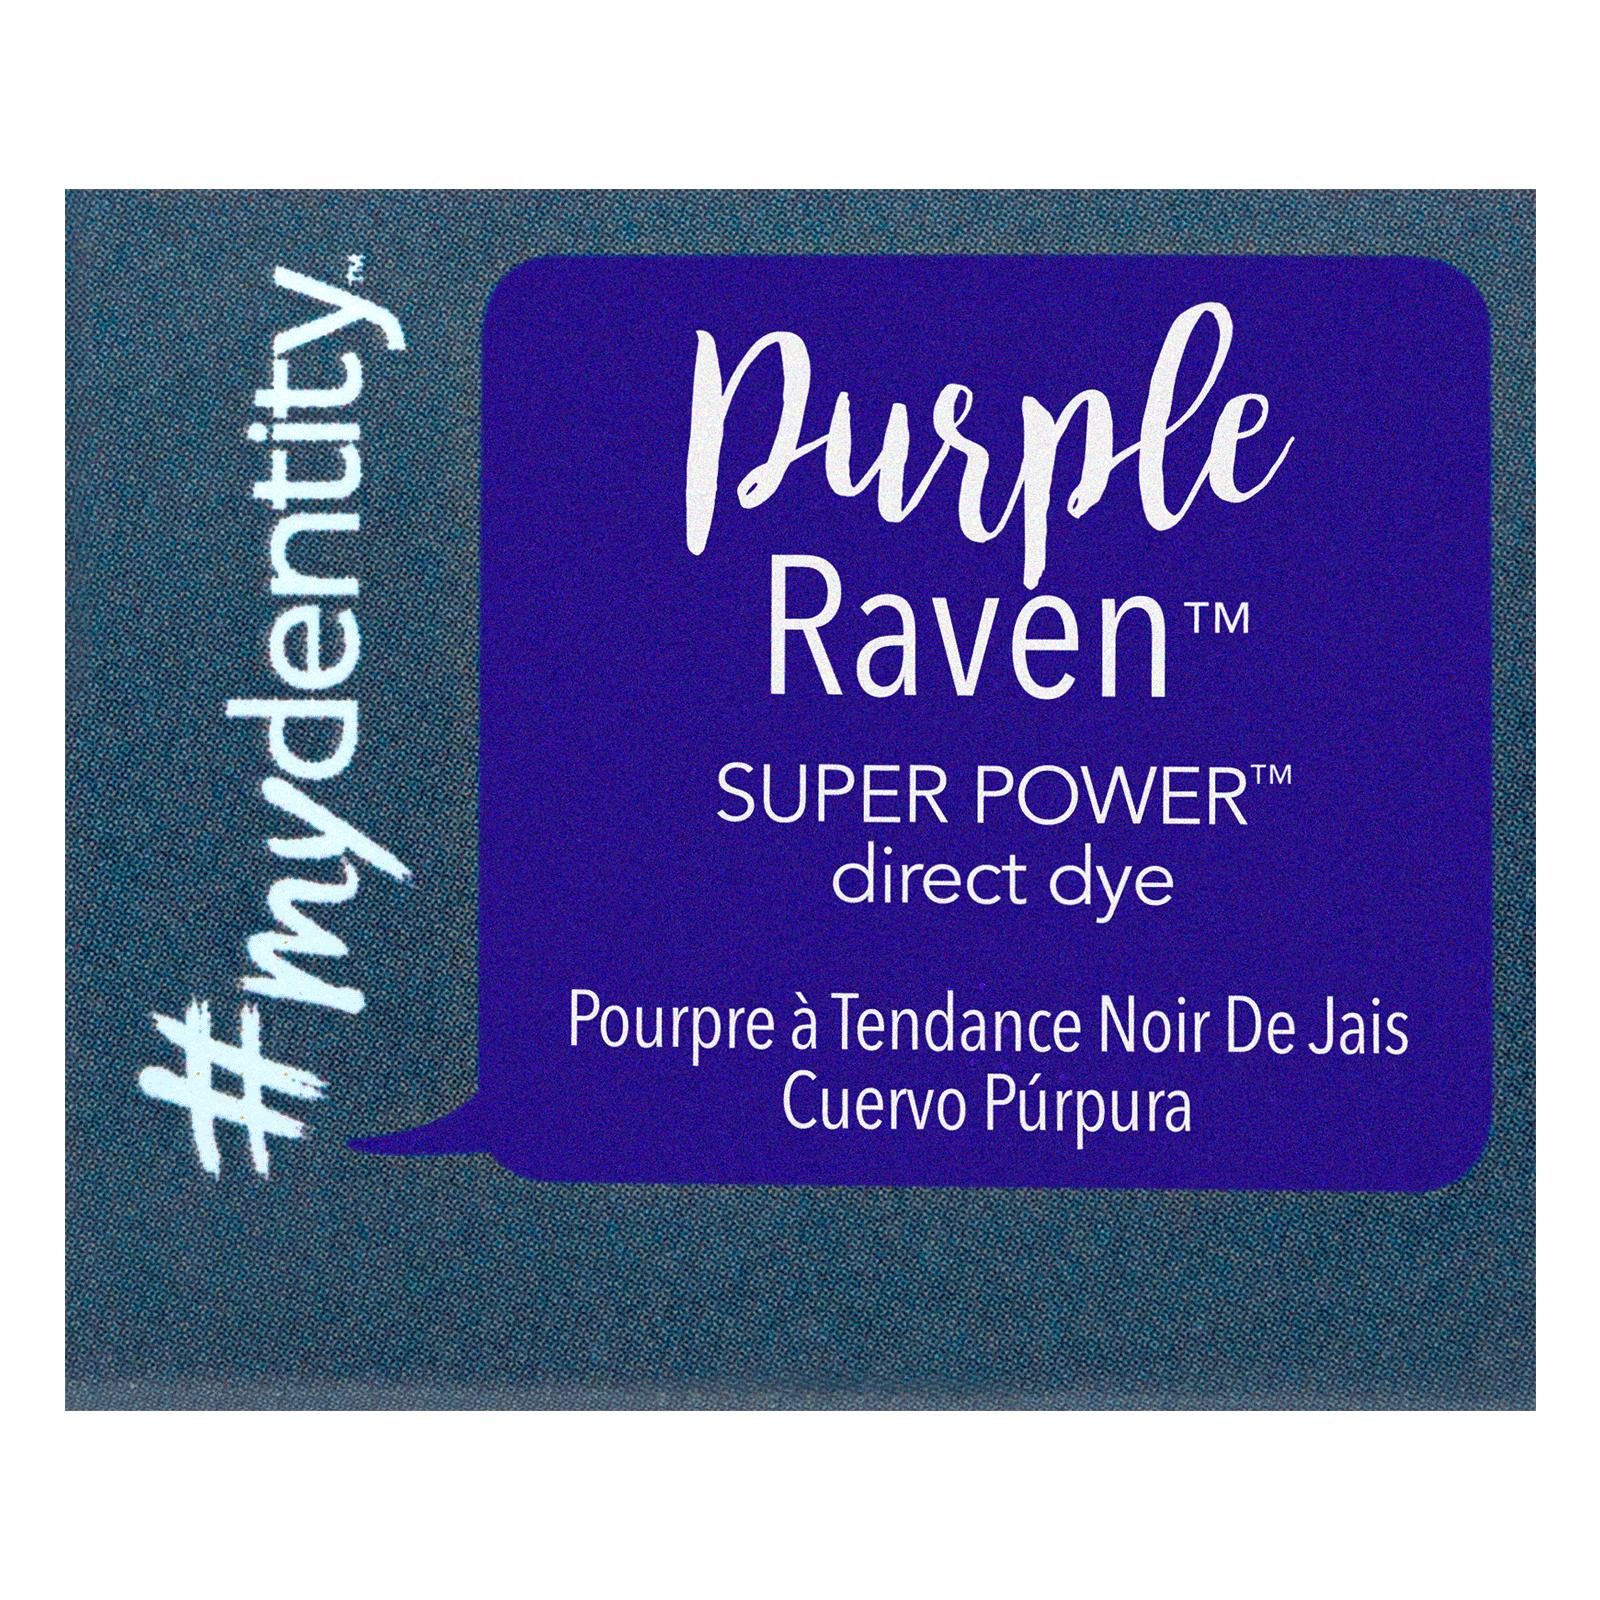 6dac6e7a01 Super Power Direct Dye - Purple Raven - #mydentity | CosmoProf